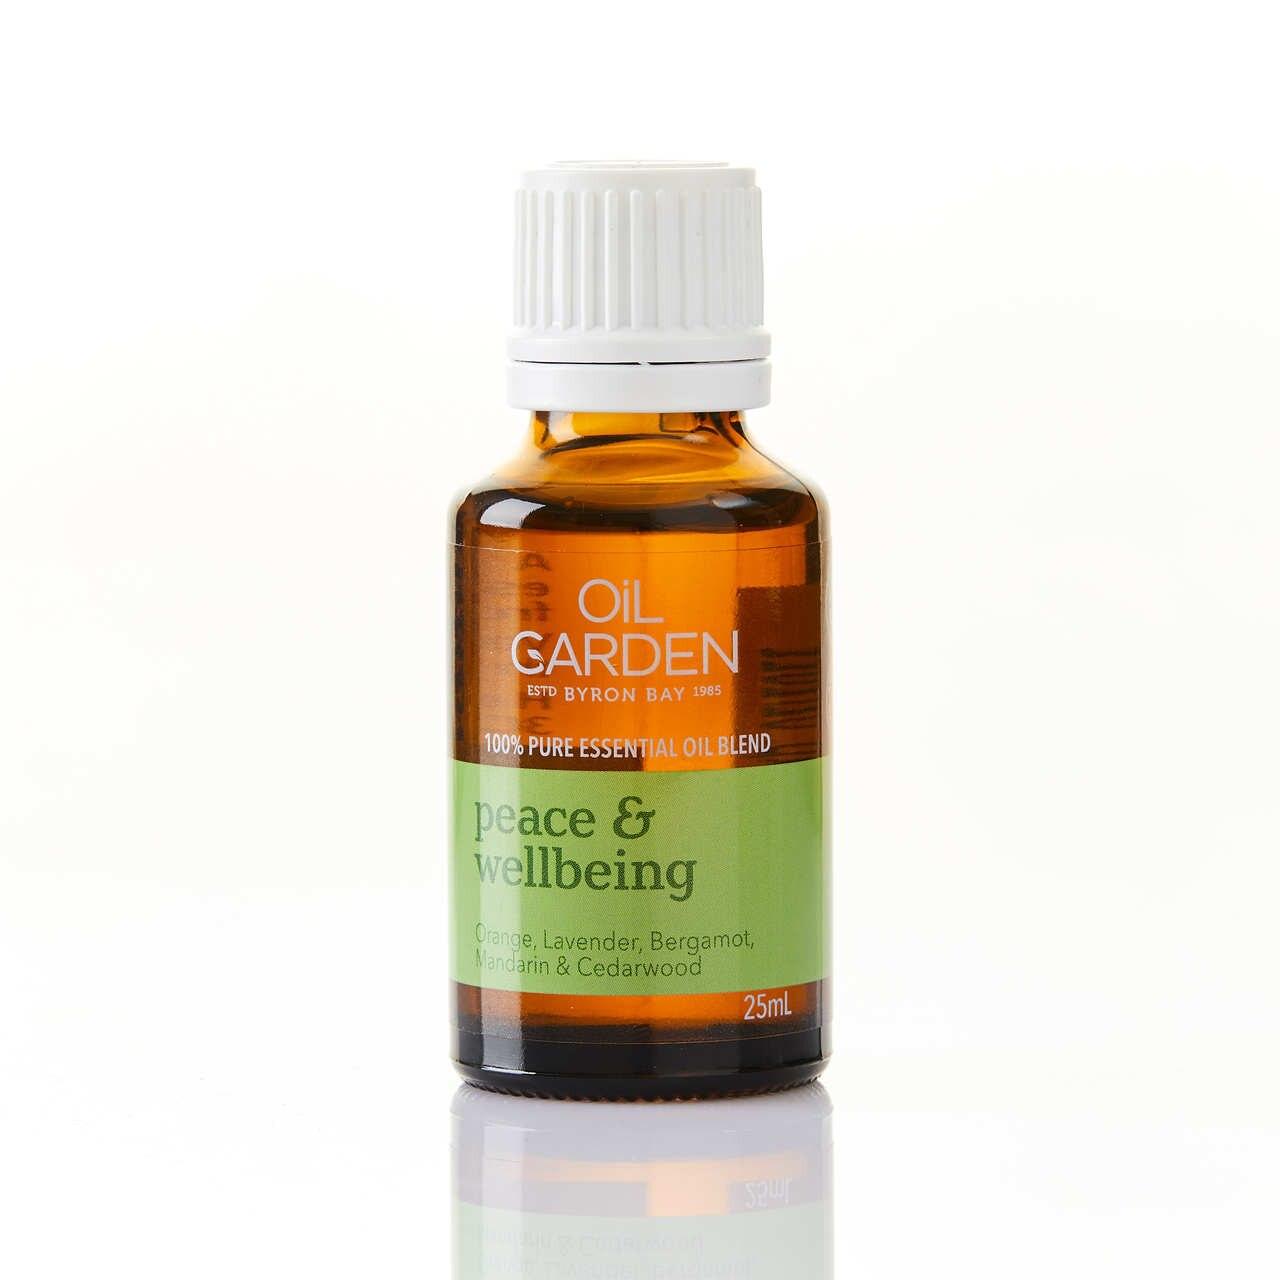 Oil Garden Peace & Wellbeing Essential Oil Blend 25mL 6620009